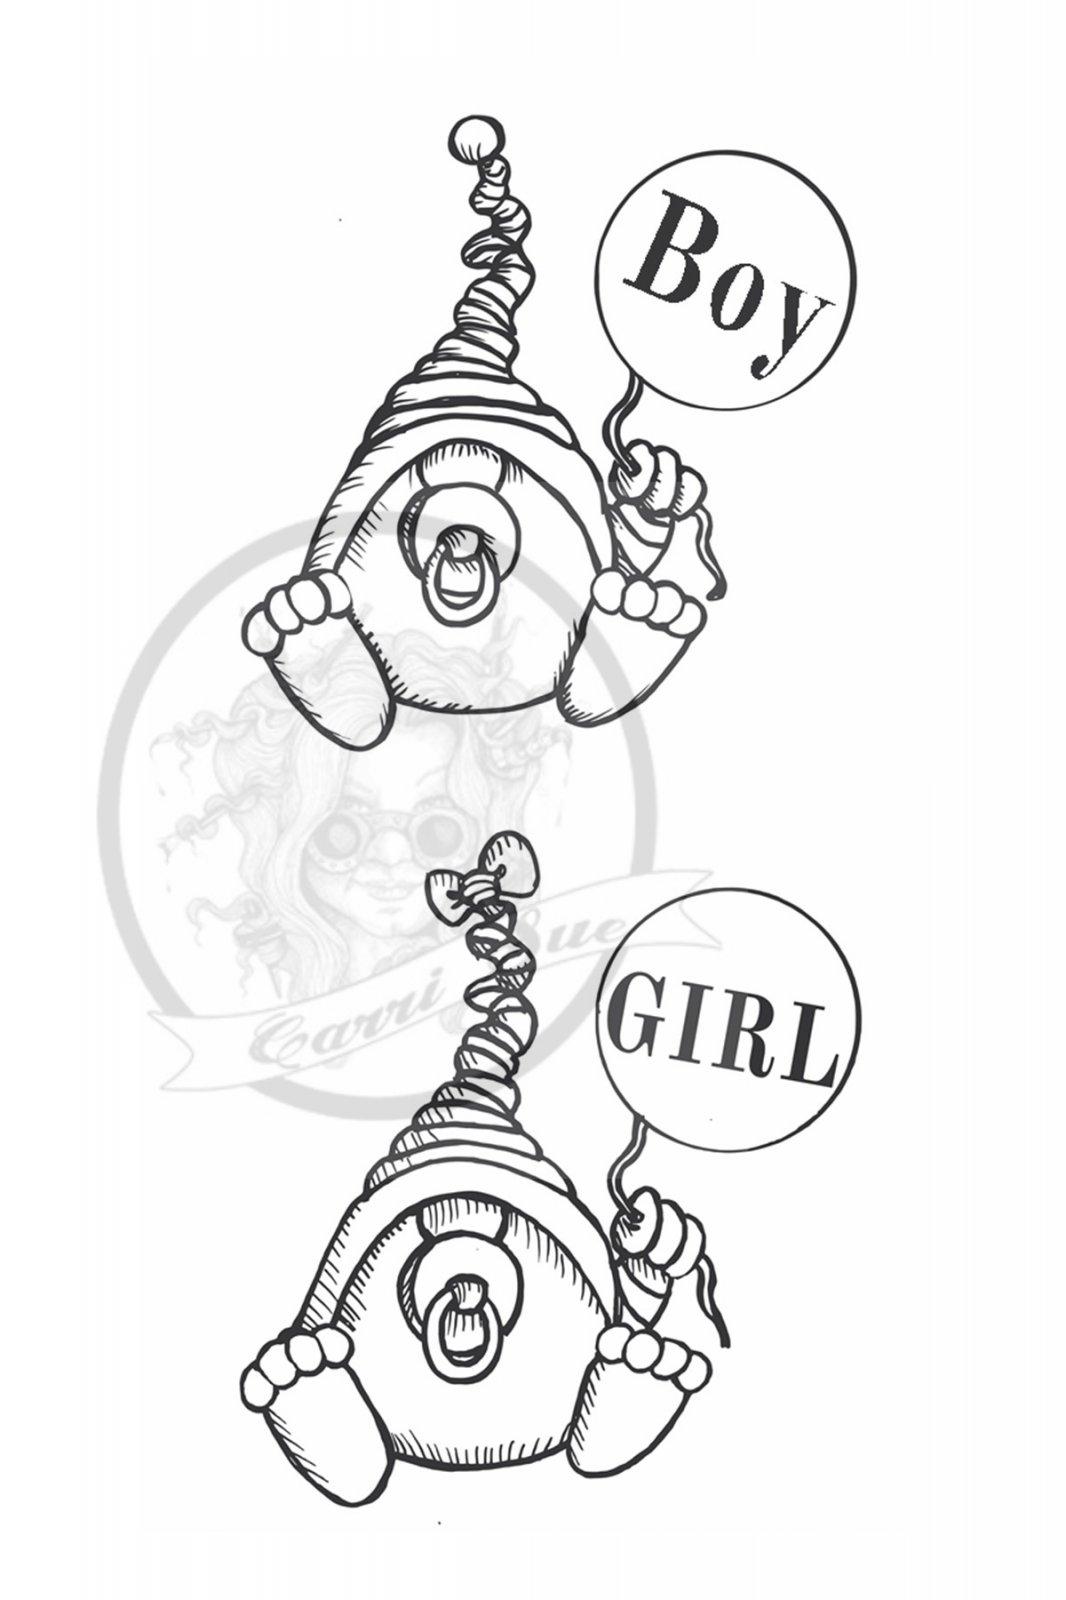 Baby Boy & Girl Gnome